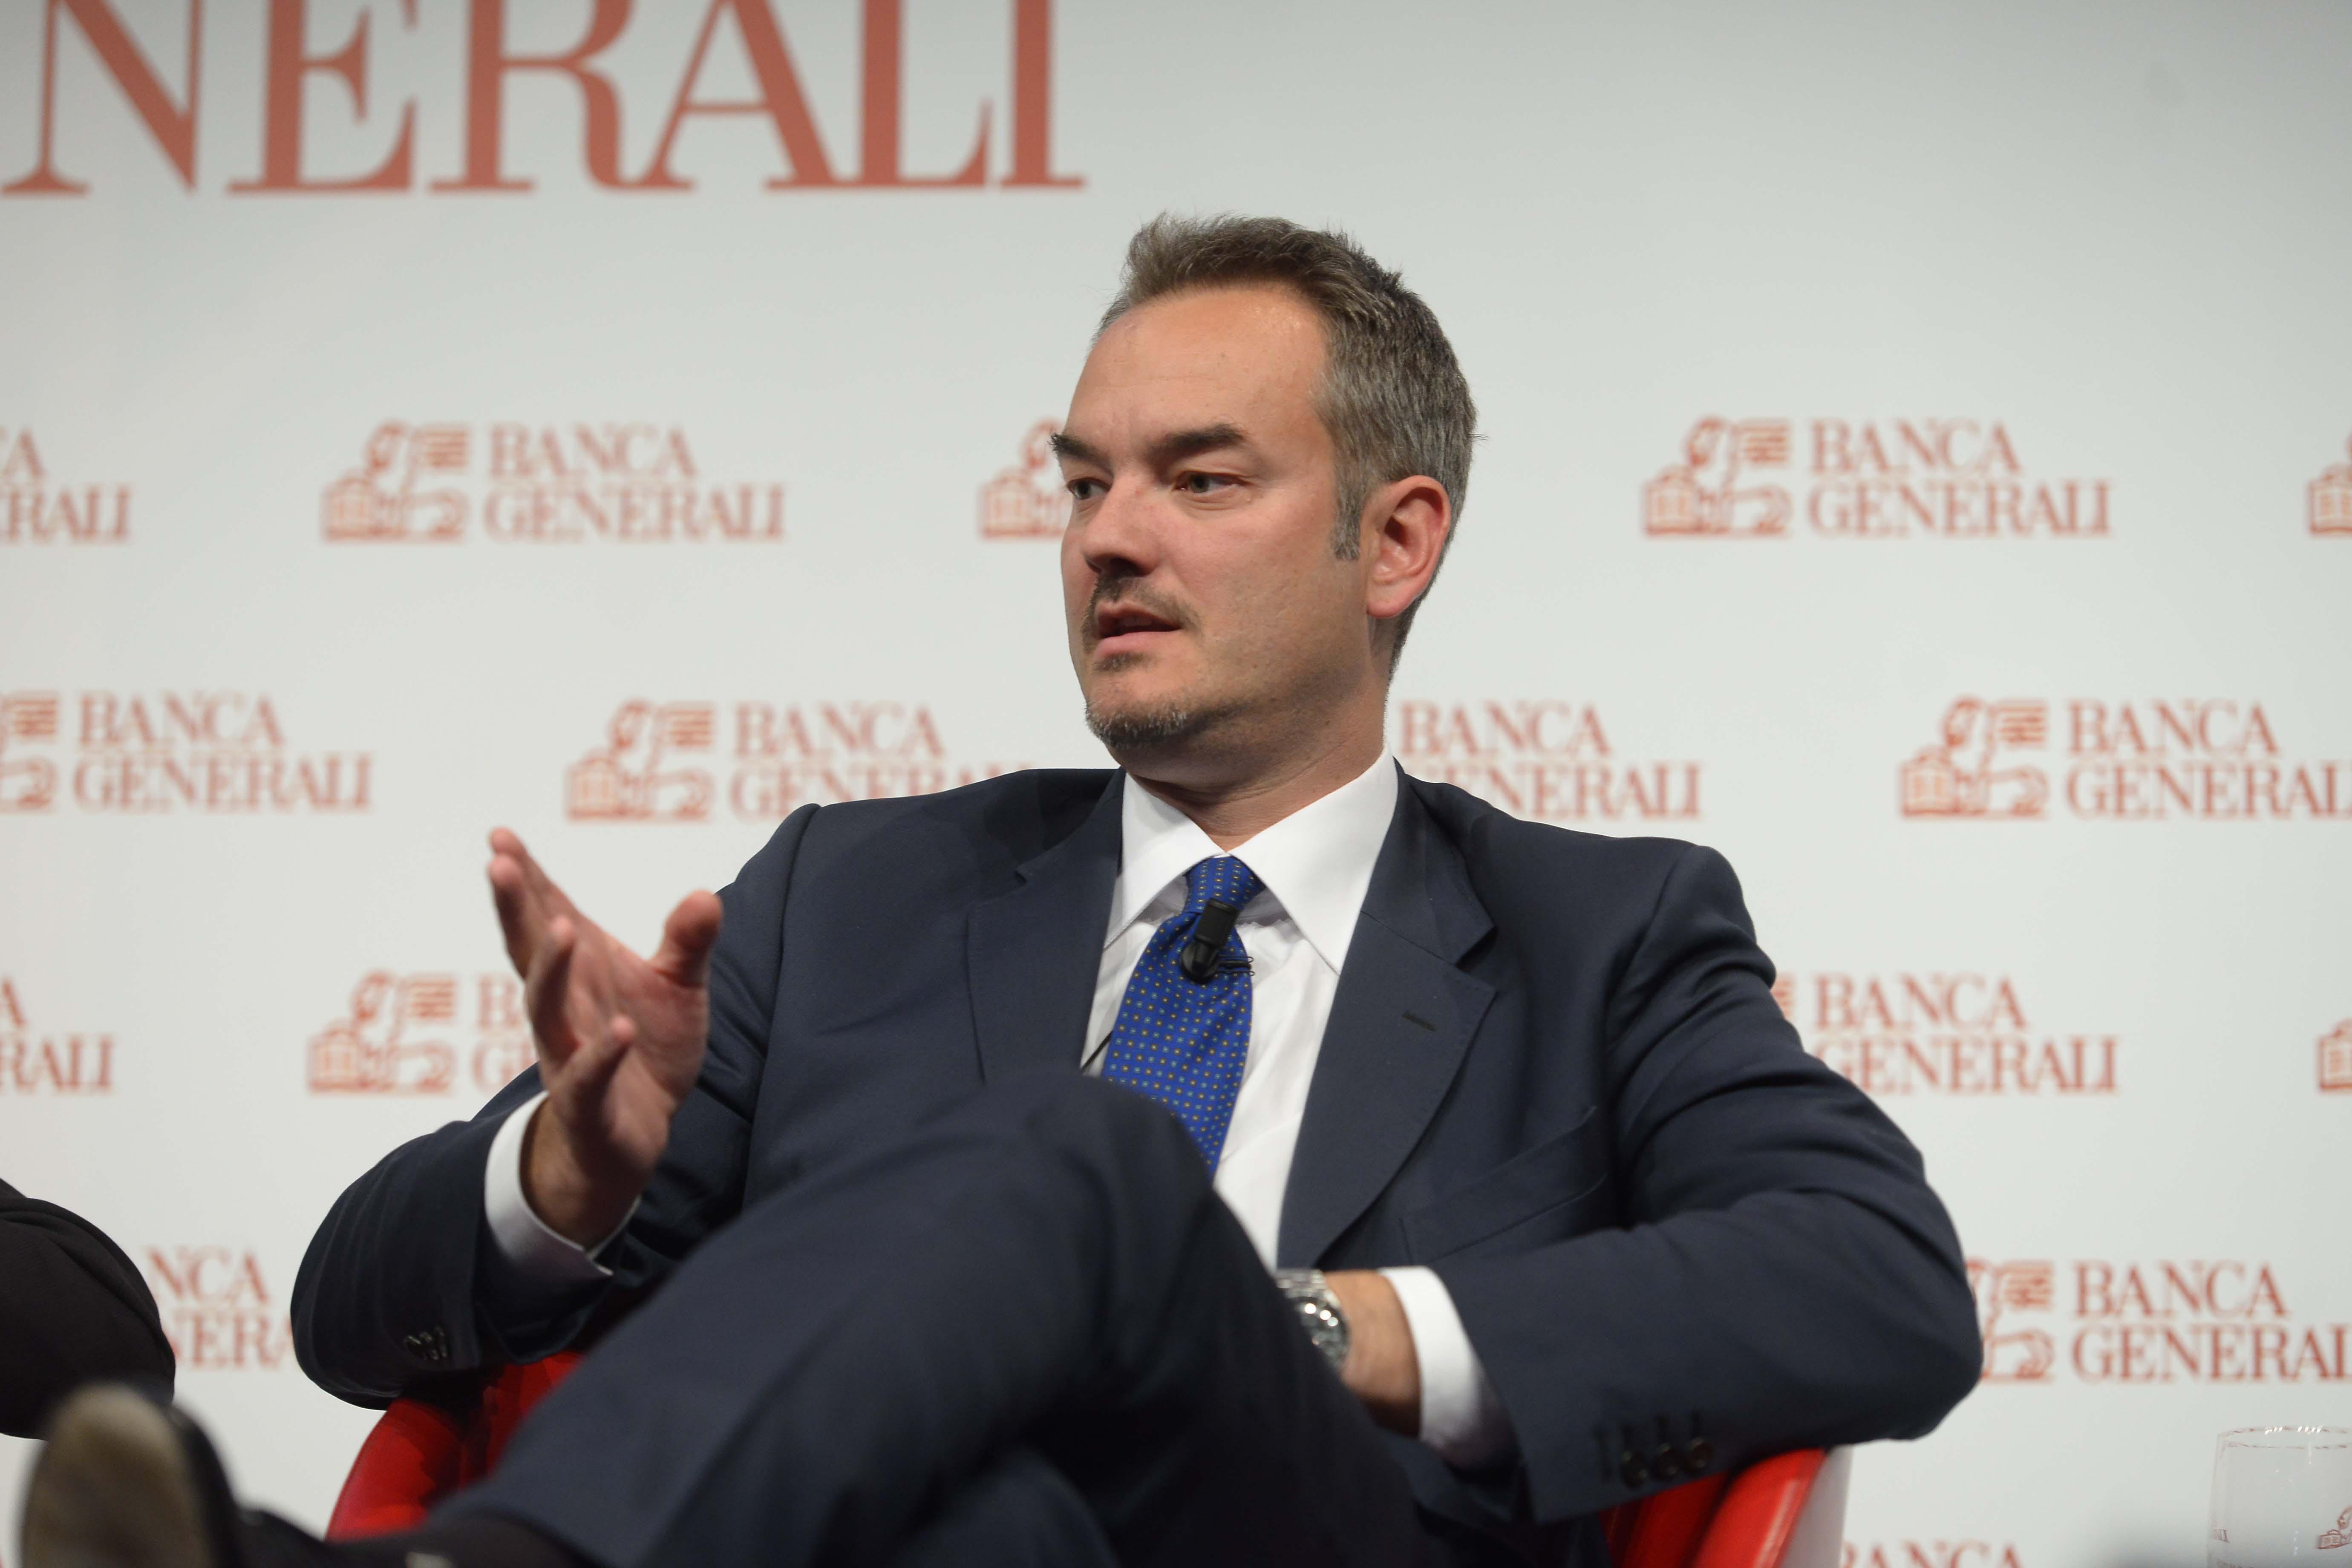 Bernardi (B. Generali): «Così rispondiamo all'emergenza Coronavirus e ai bisogni di clienti»